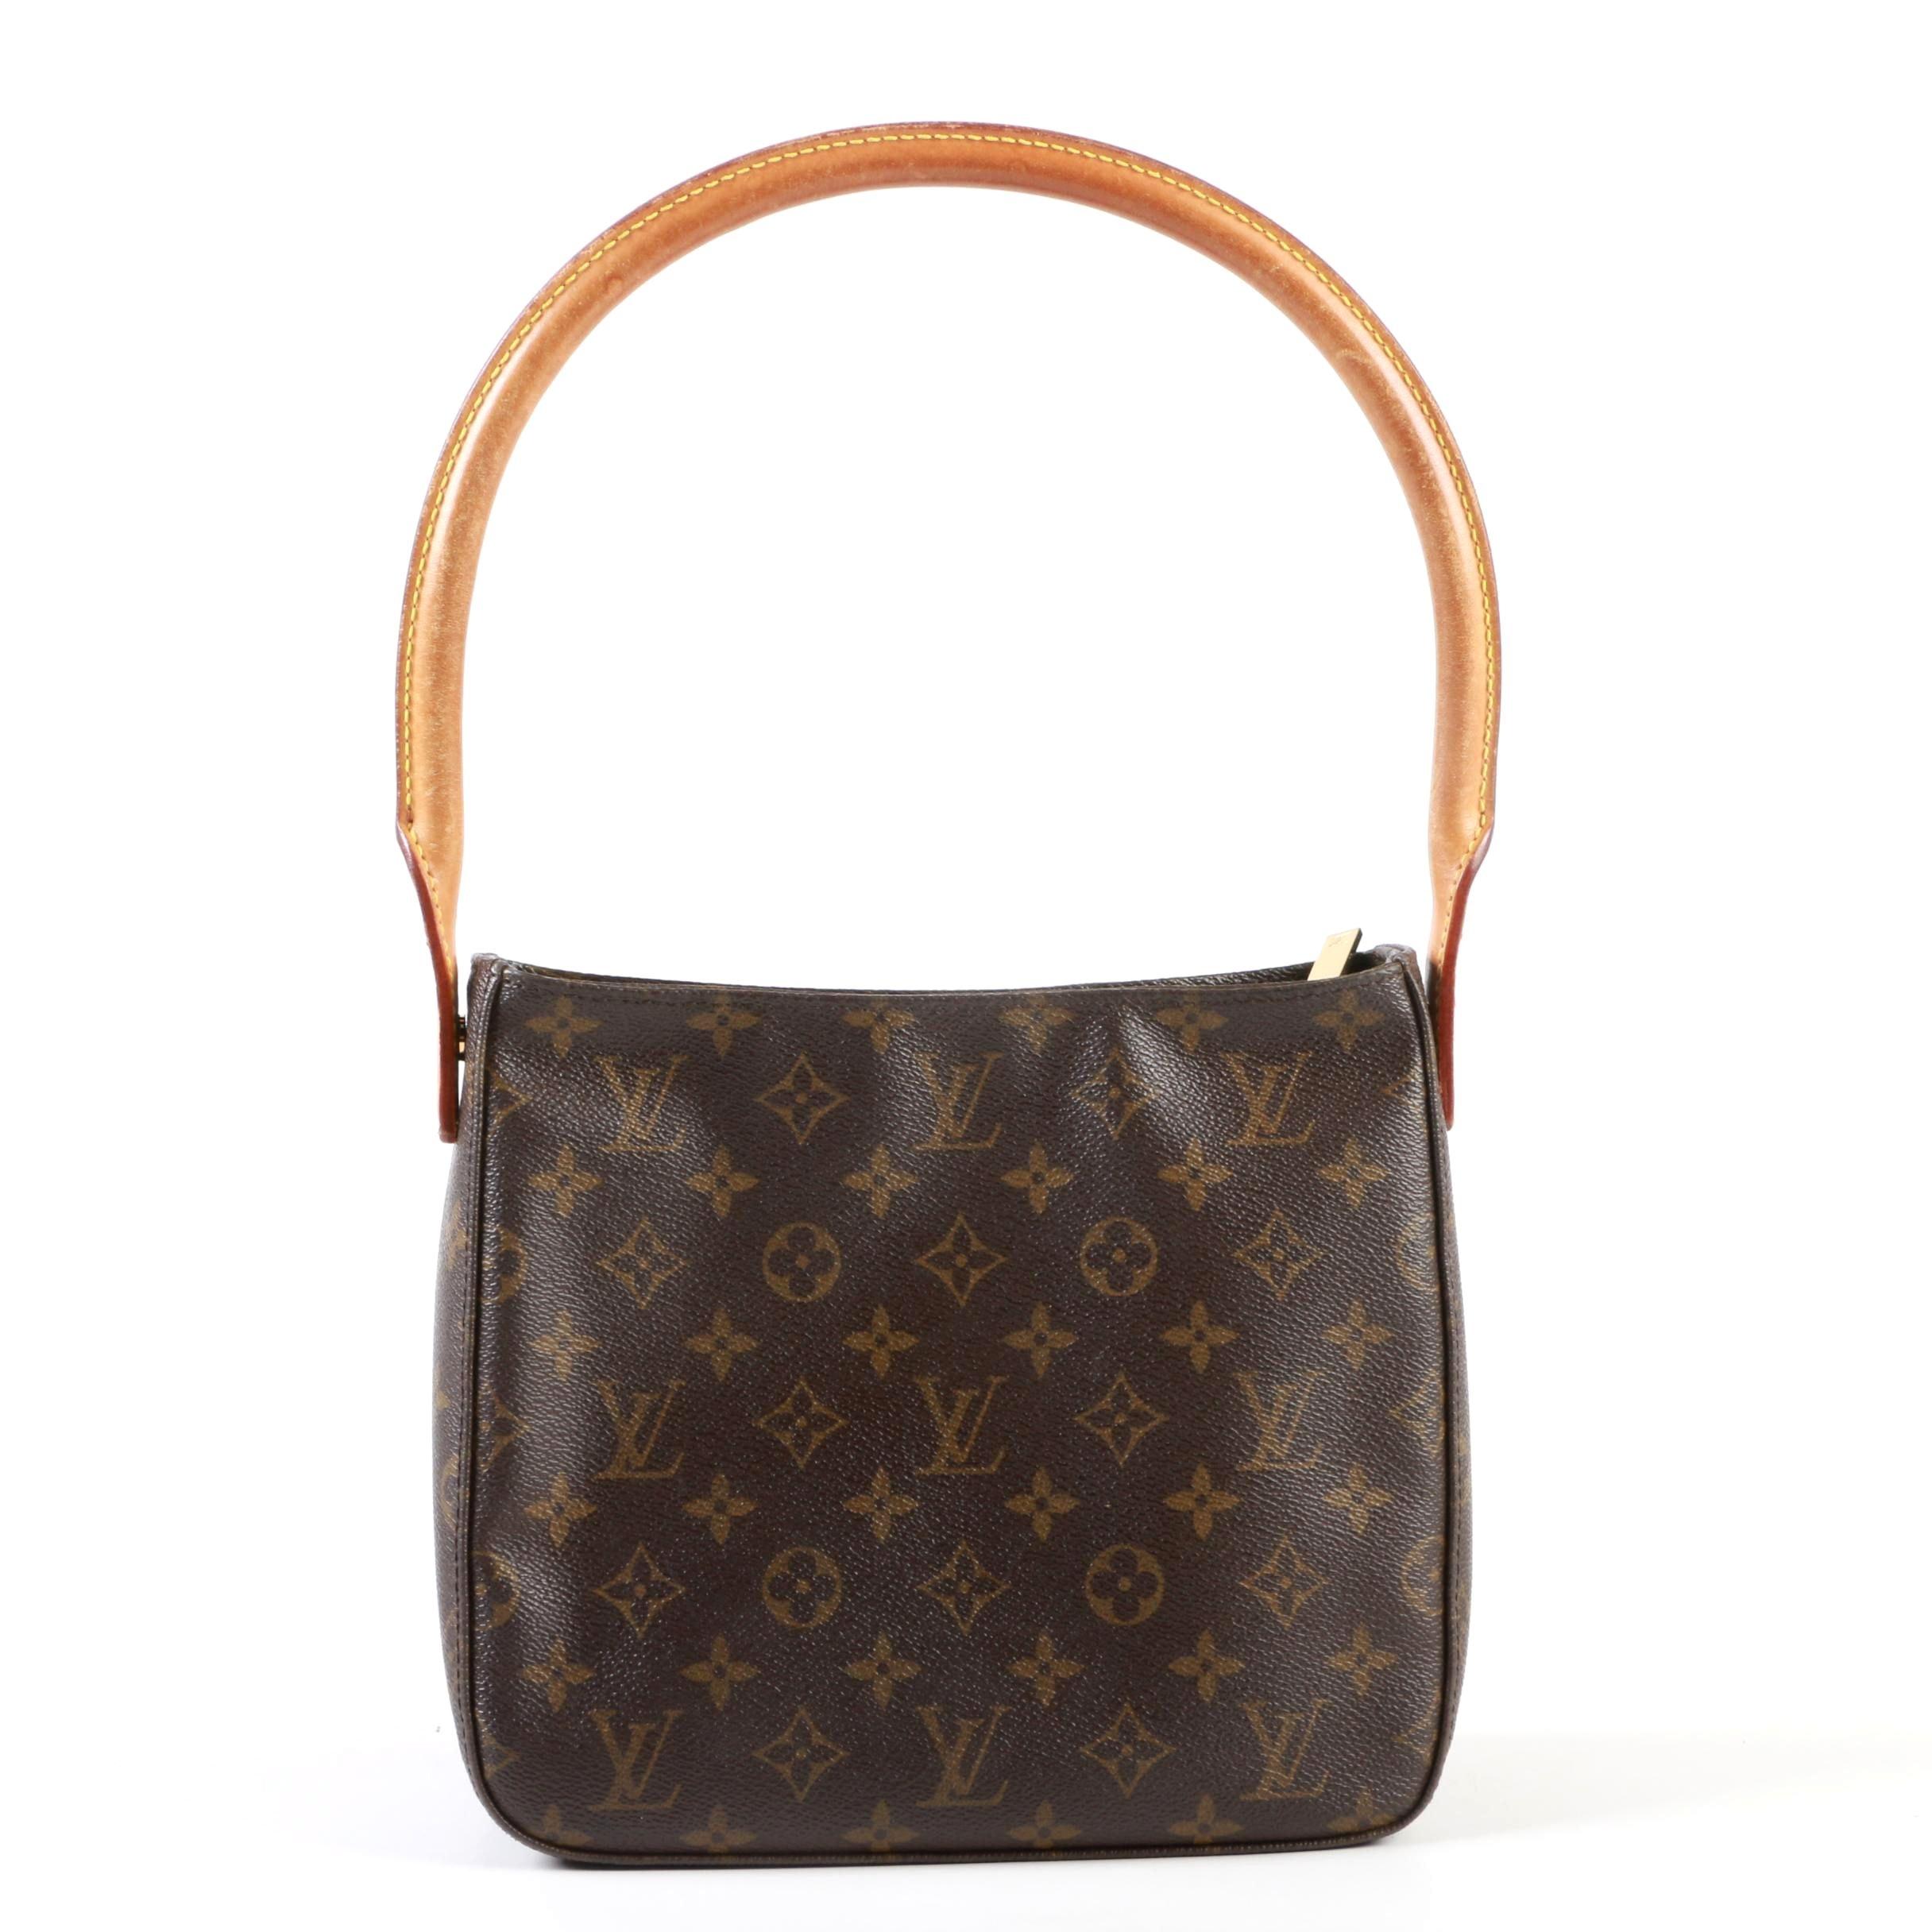 Louis Vuitton Paris Looping MM Handbag in Monogram Canvas